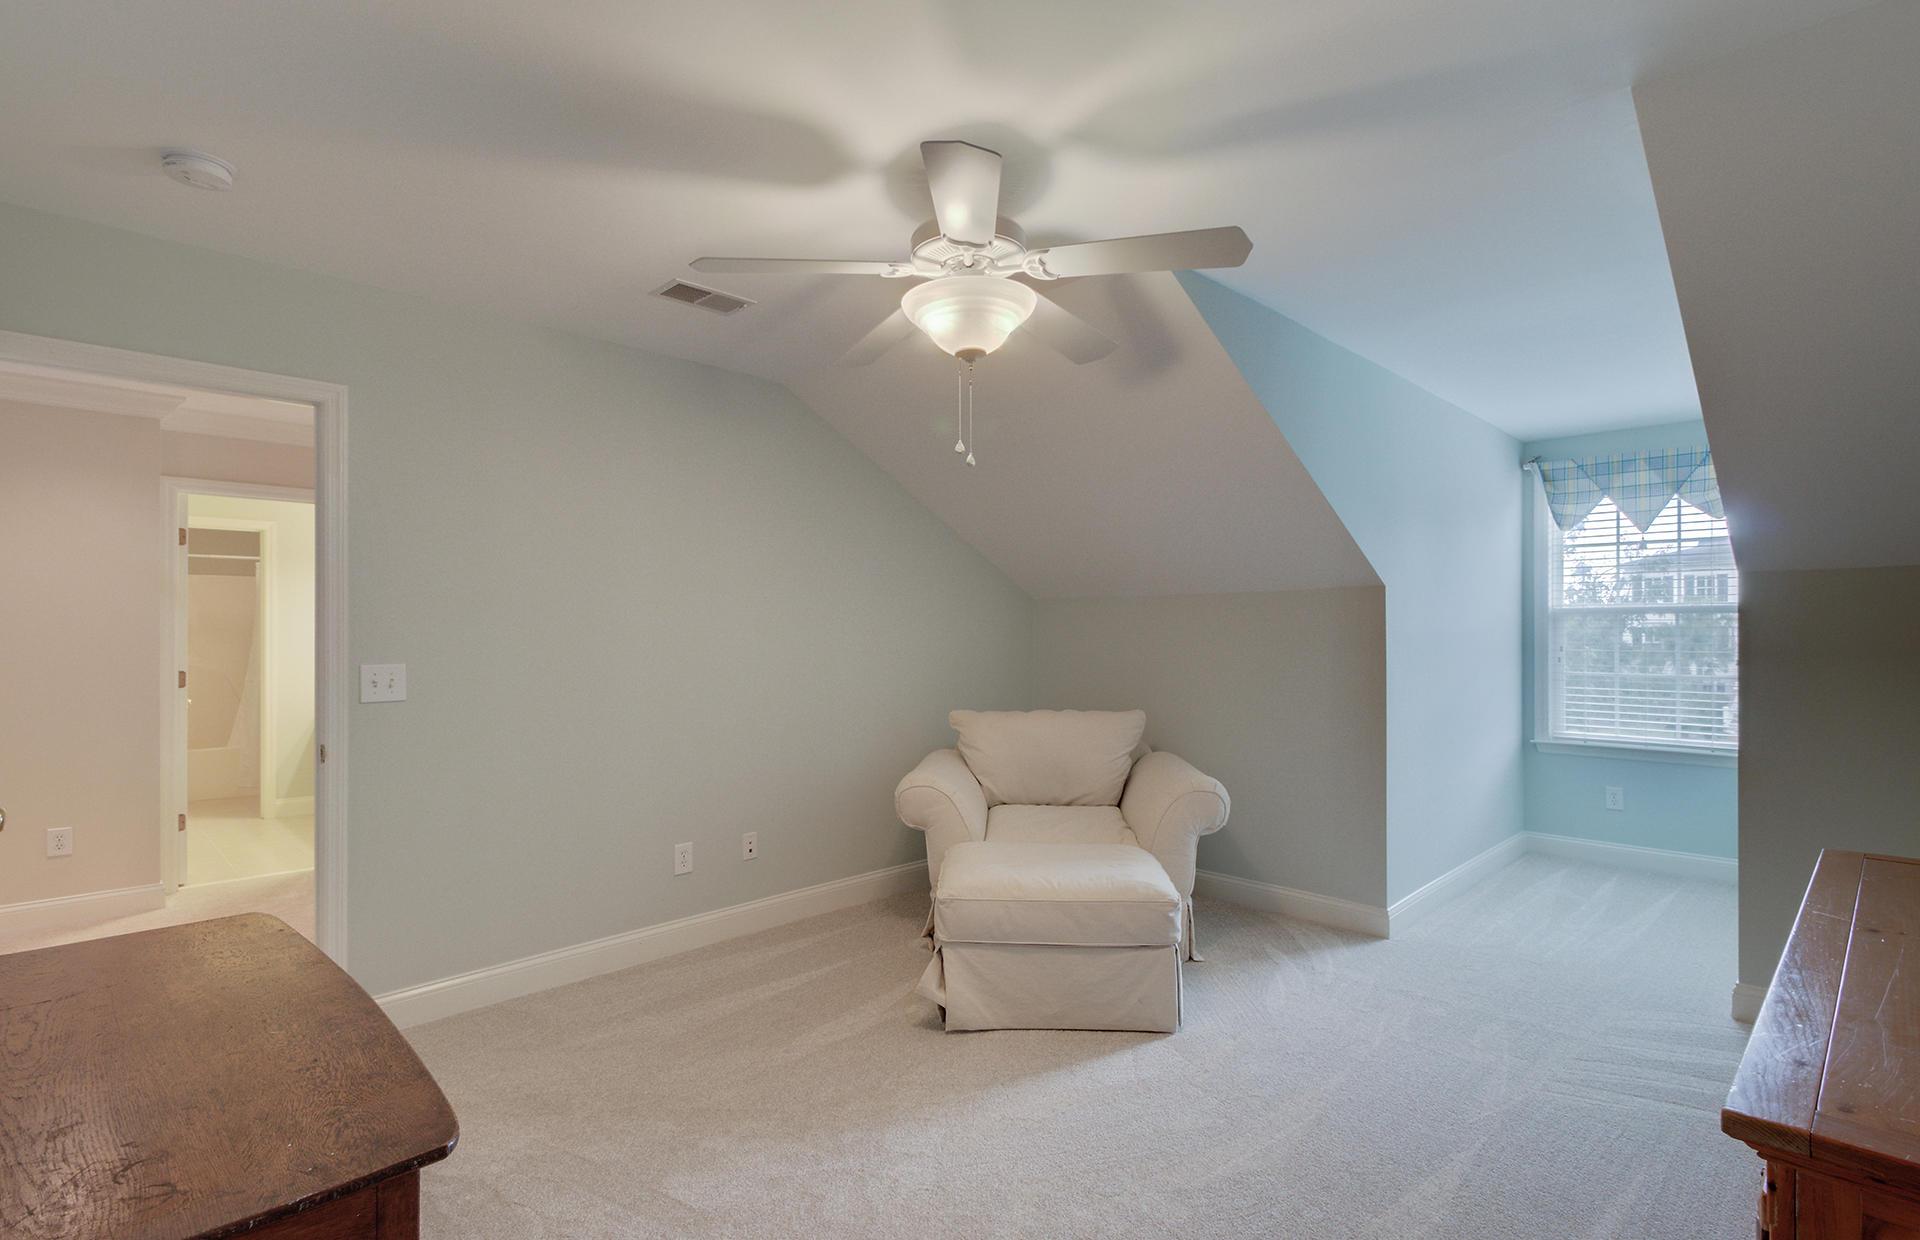 Dunes West Homes For Sale - 2453 Darts Cove, Mount Pleasant, SC - 23